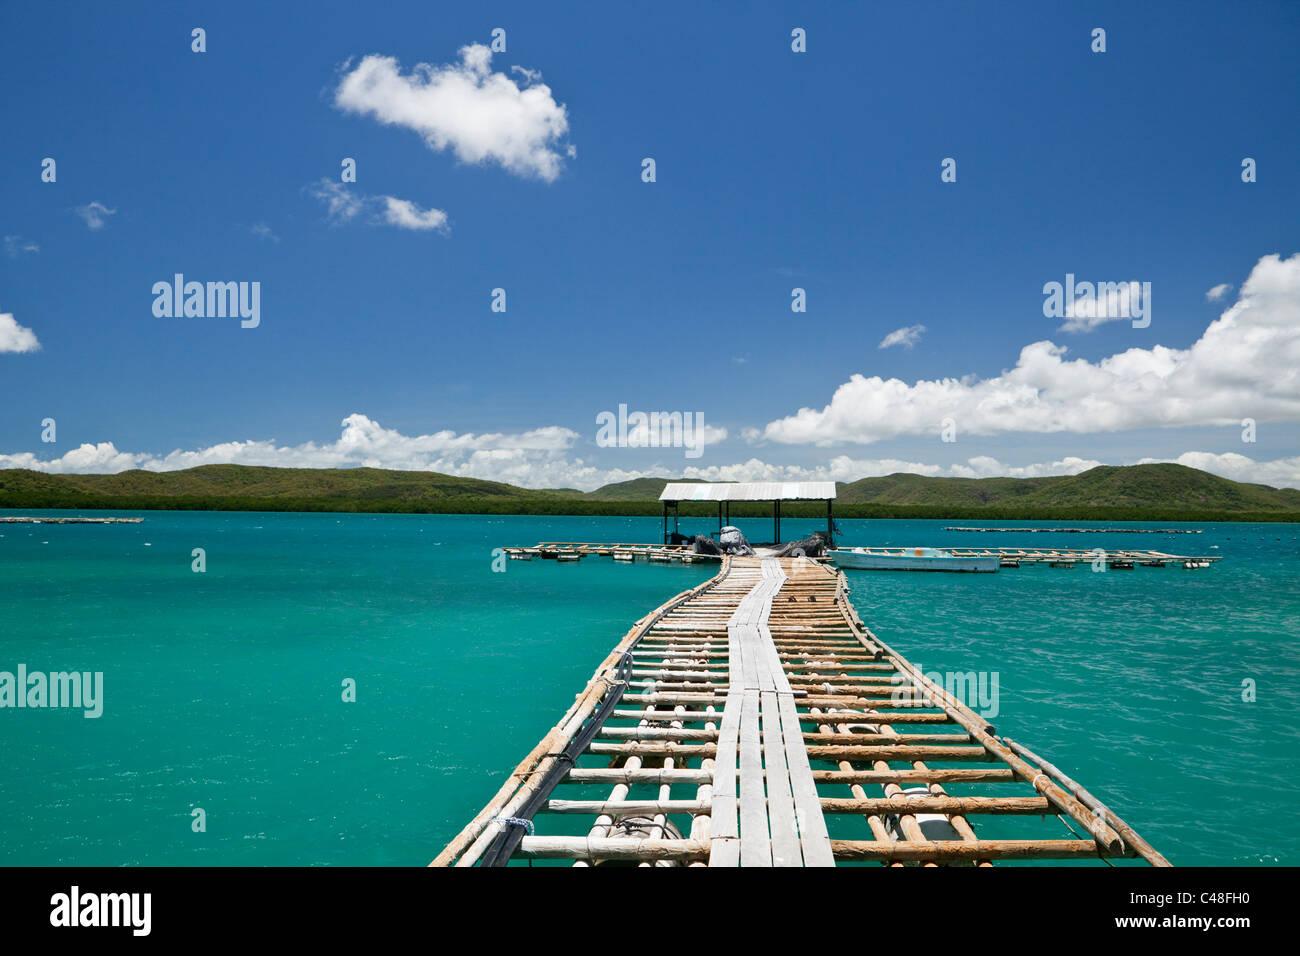 Jetty at Kazu Pearls pearl farm.  Friday Island, Torres Strait Islands, Queensland, Australia - Stock Image